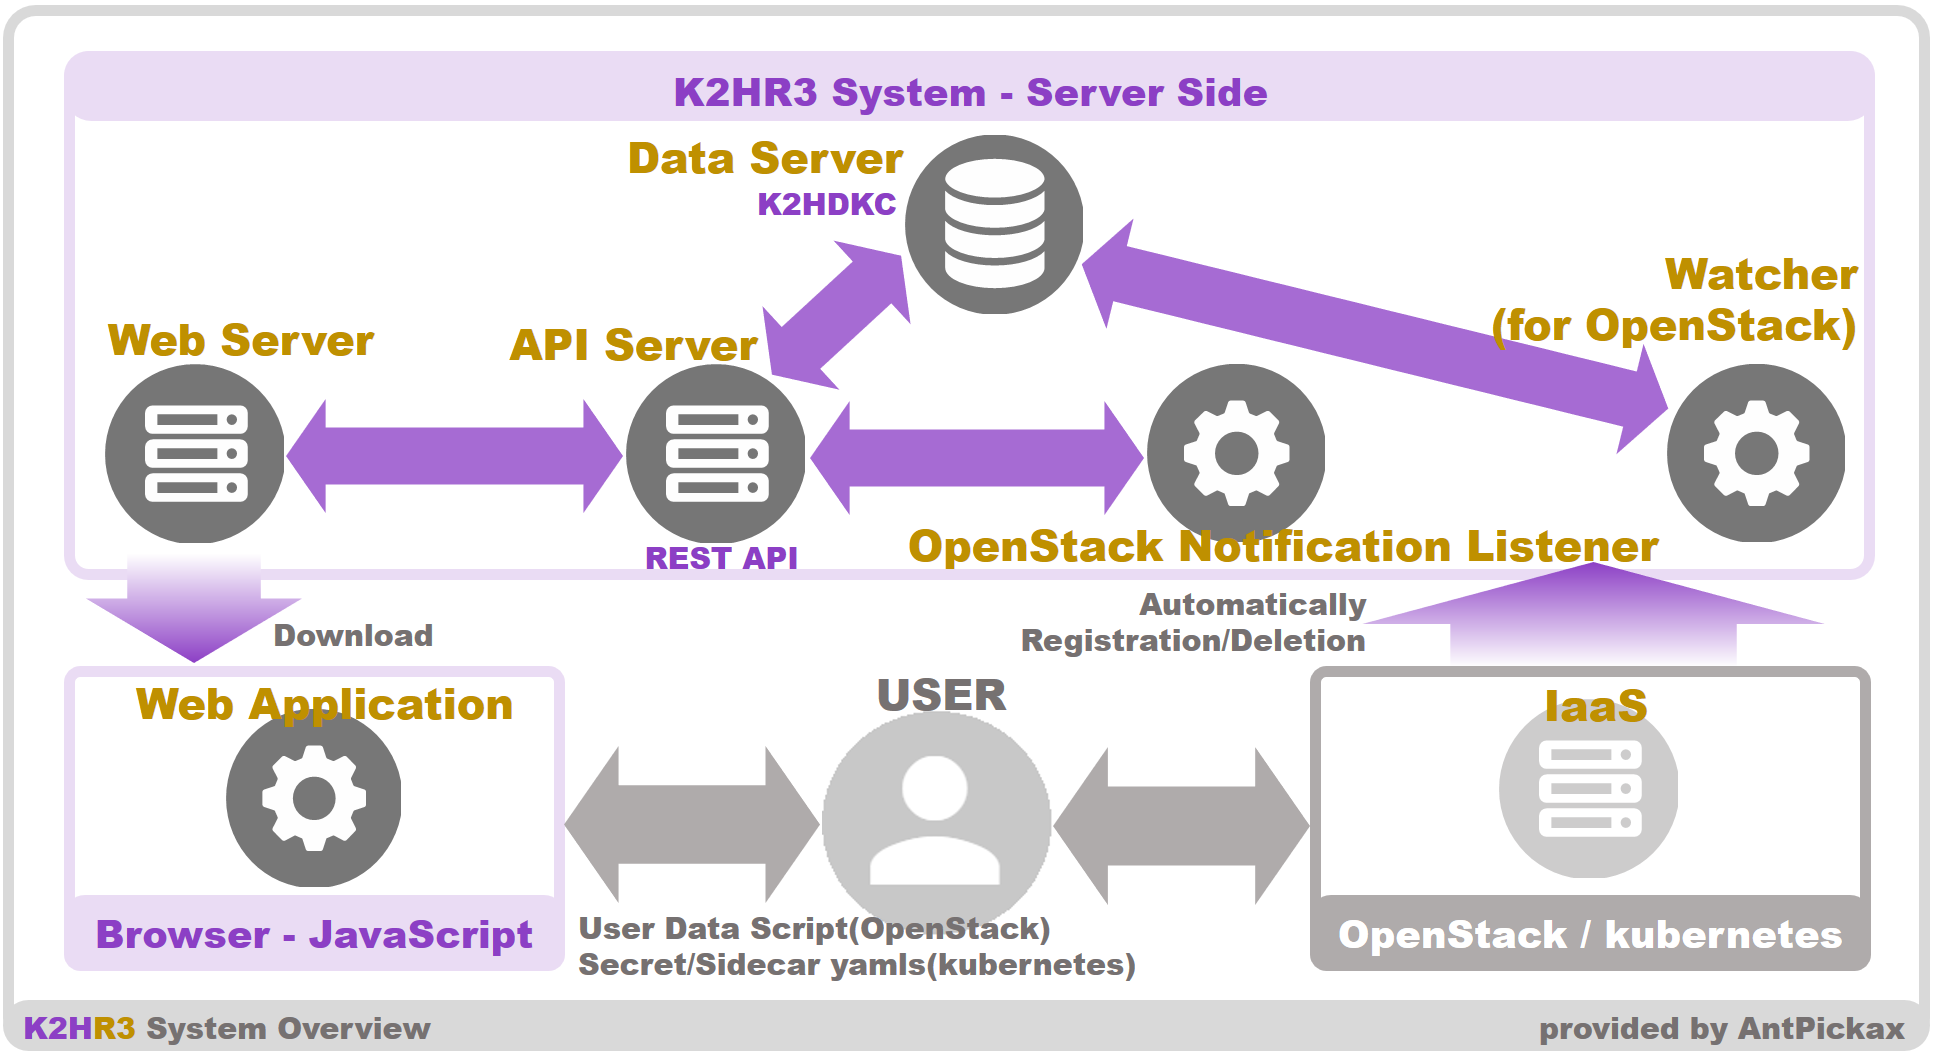 K2HR3 system overview